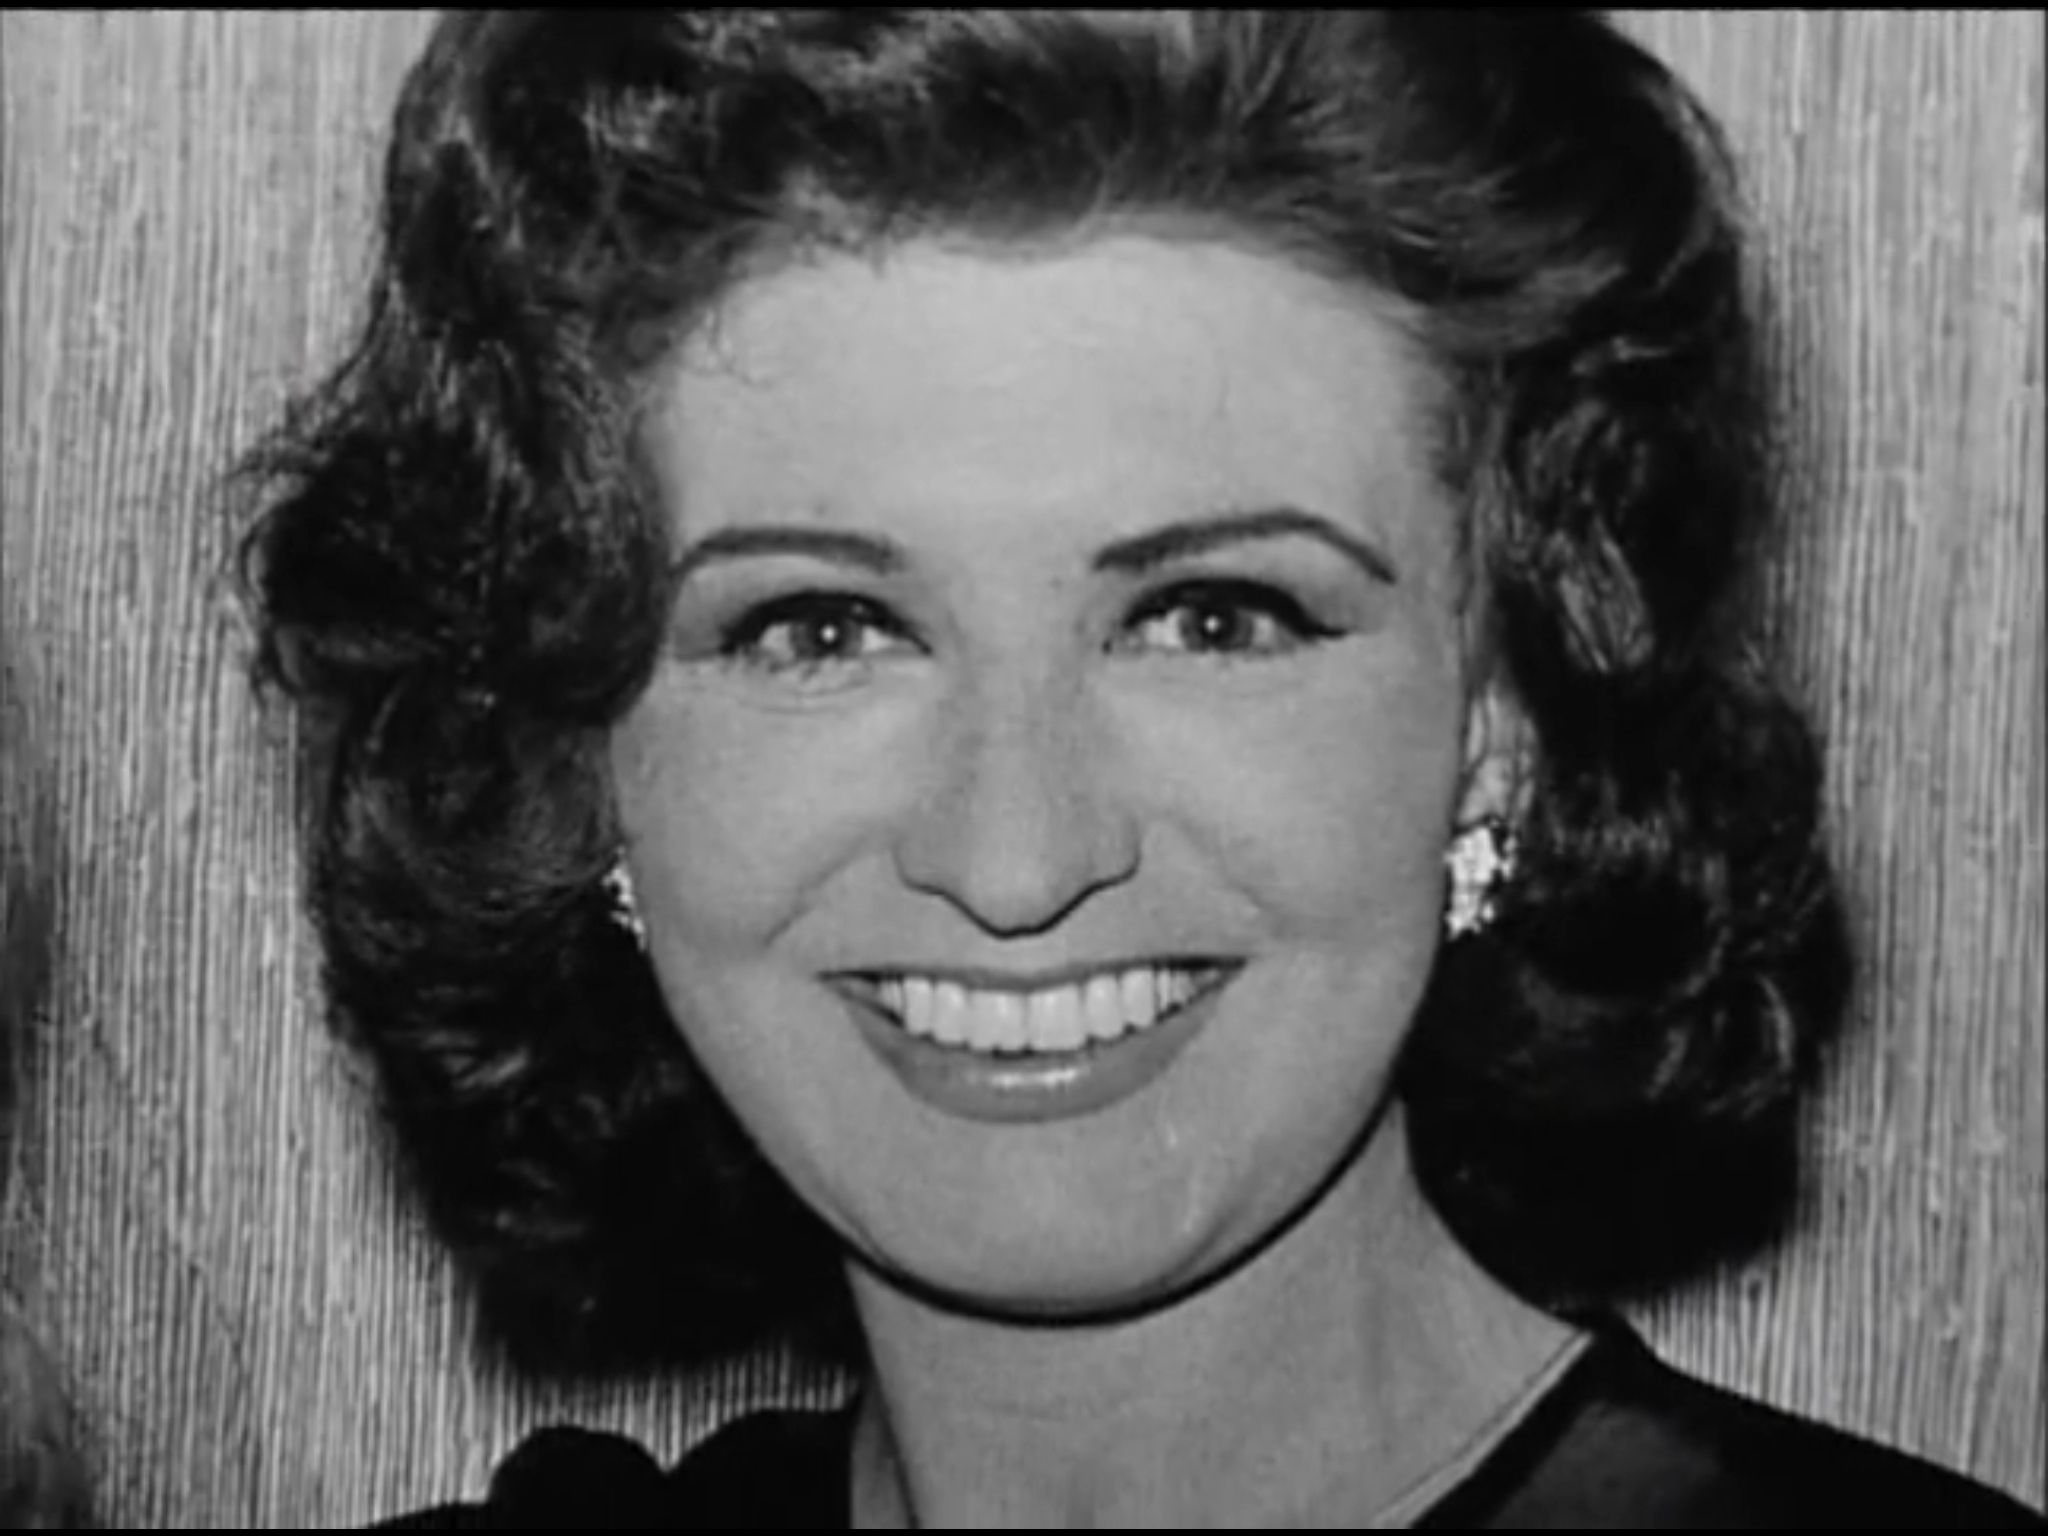 Rejane Magloire Adult tube Anthony Hopkins (born 1937 (naturalized American citizen),Pauline Collins (born 1940)